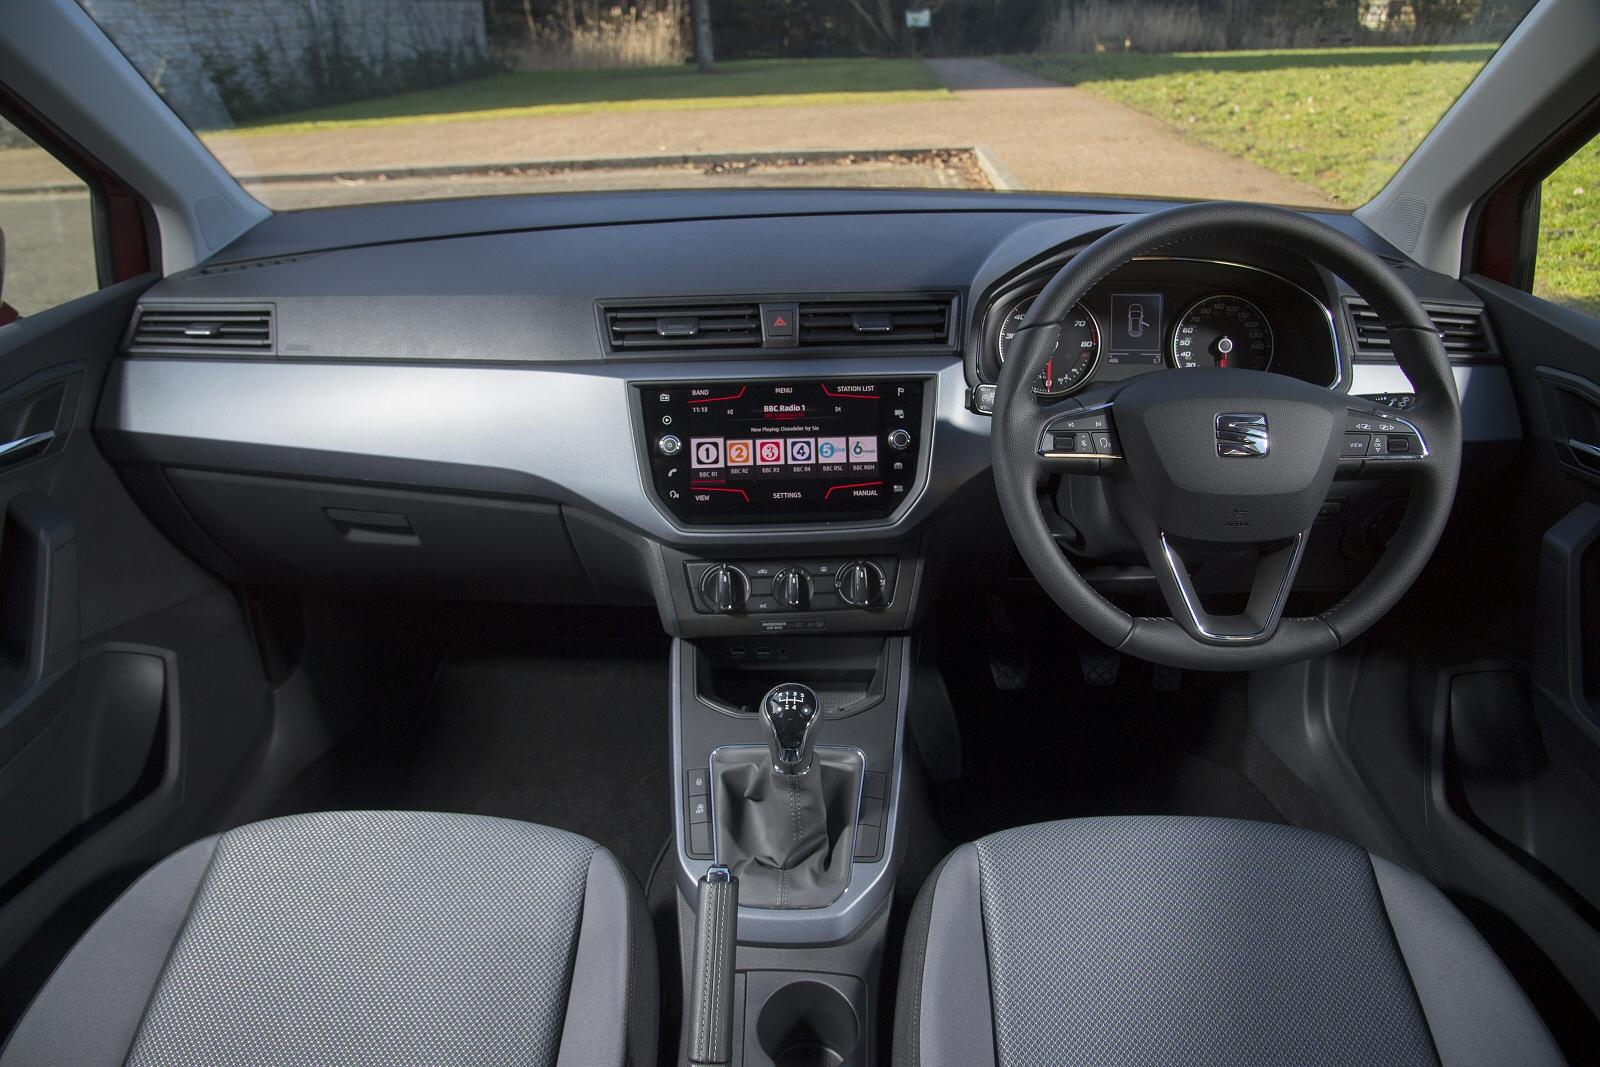 ... 1.0 Tsi 115 Xcellence Lux [ez] 5Dr Dsg Petrol Hatchback